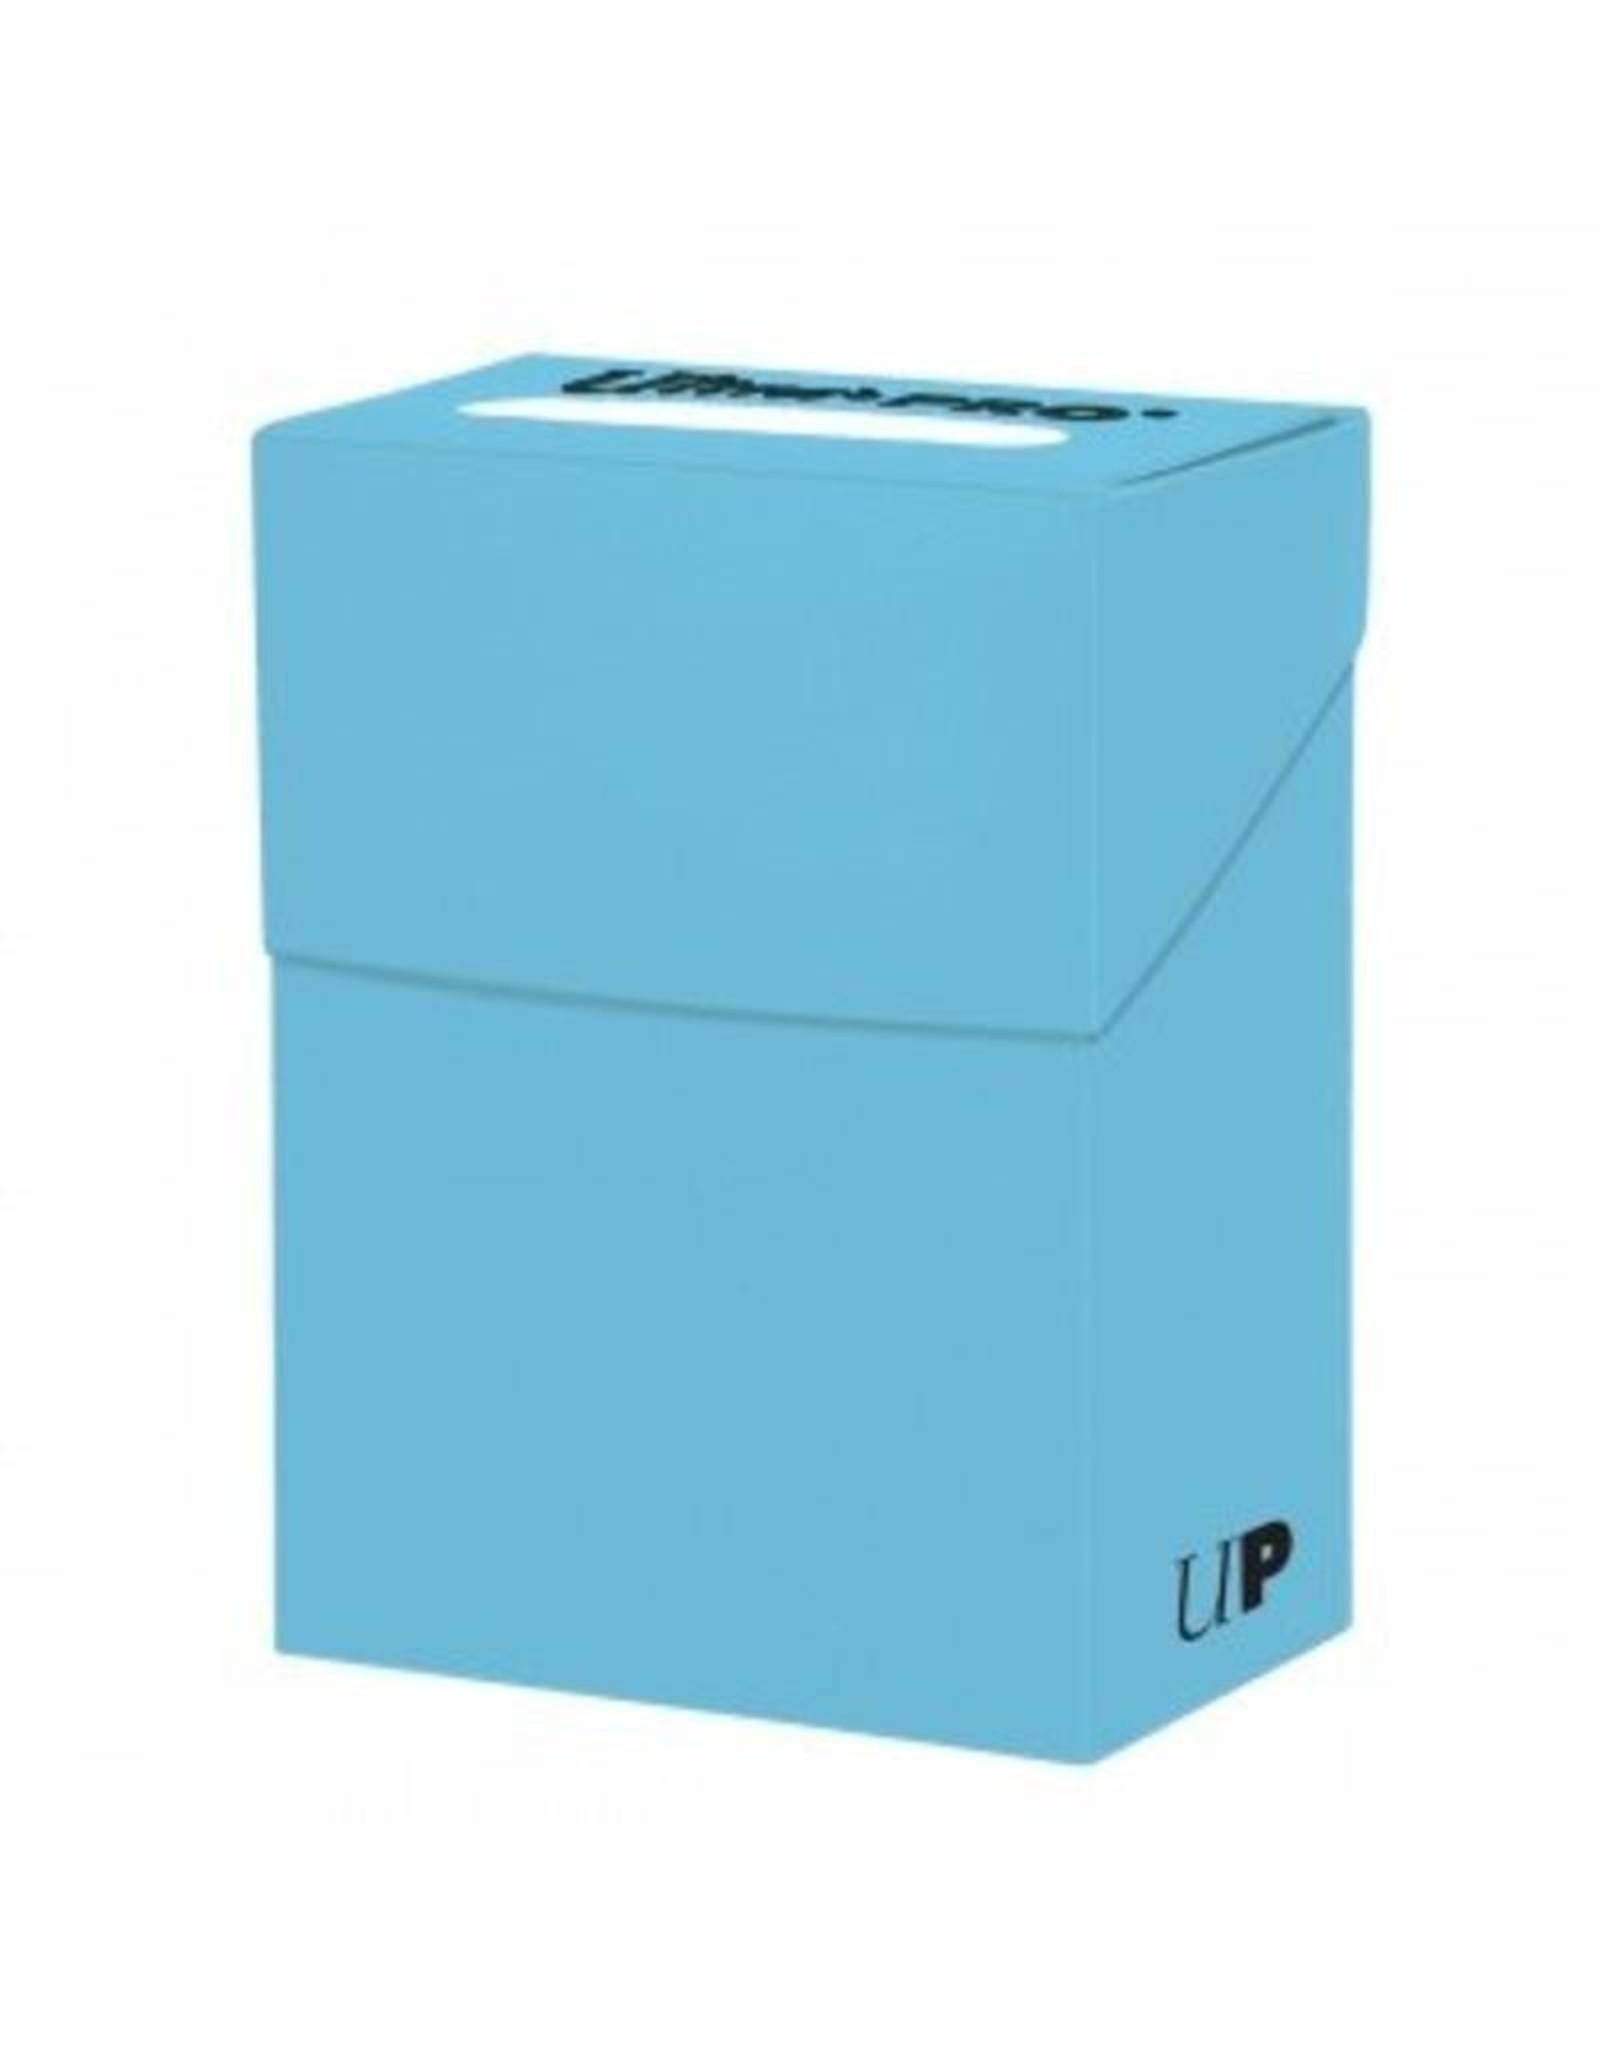 ULTRA PRO Beck Box light blue